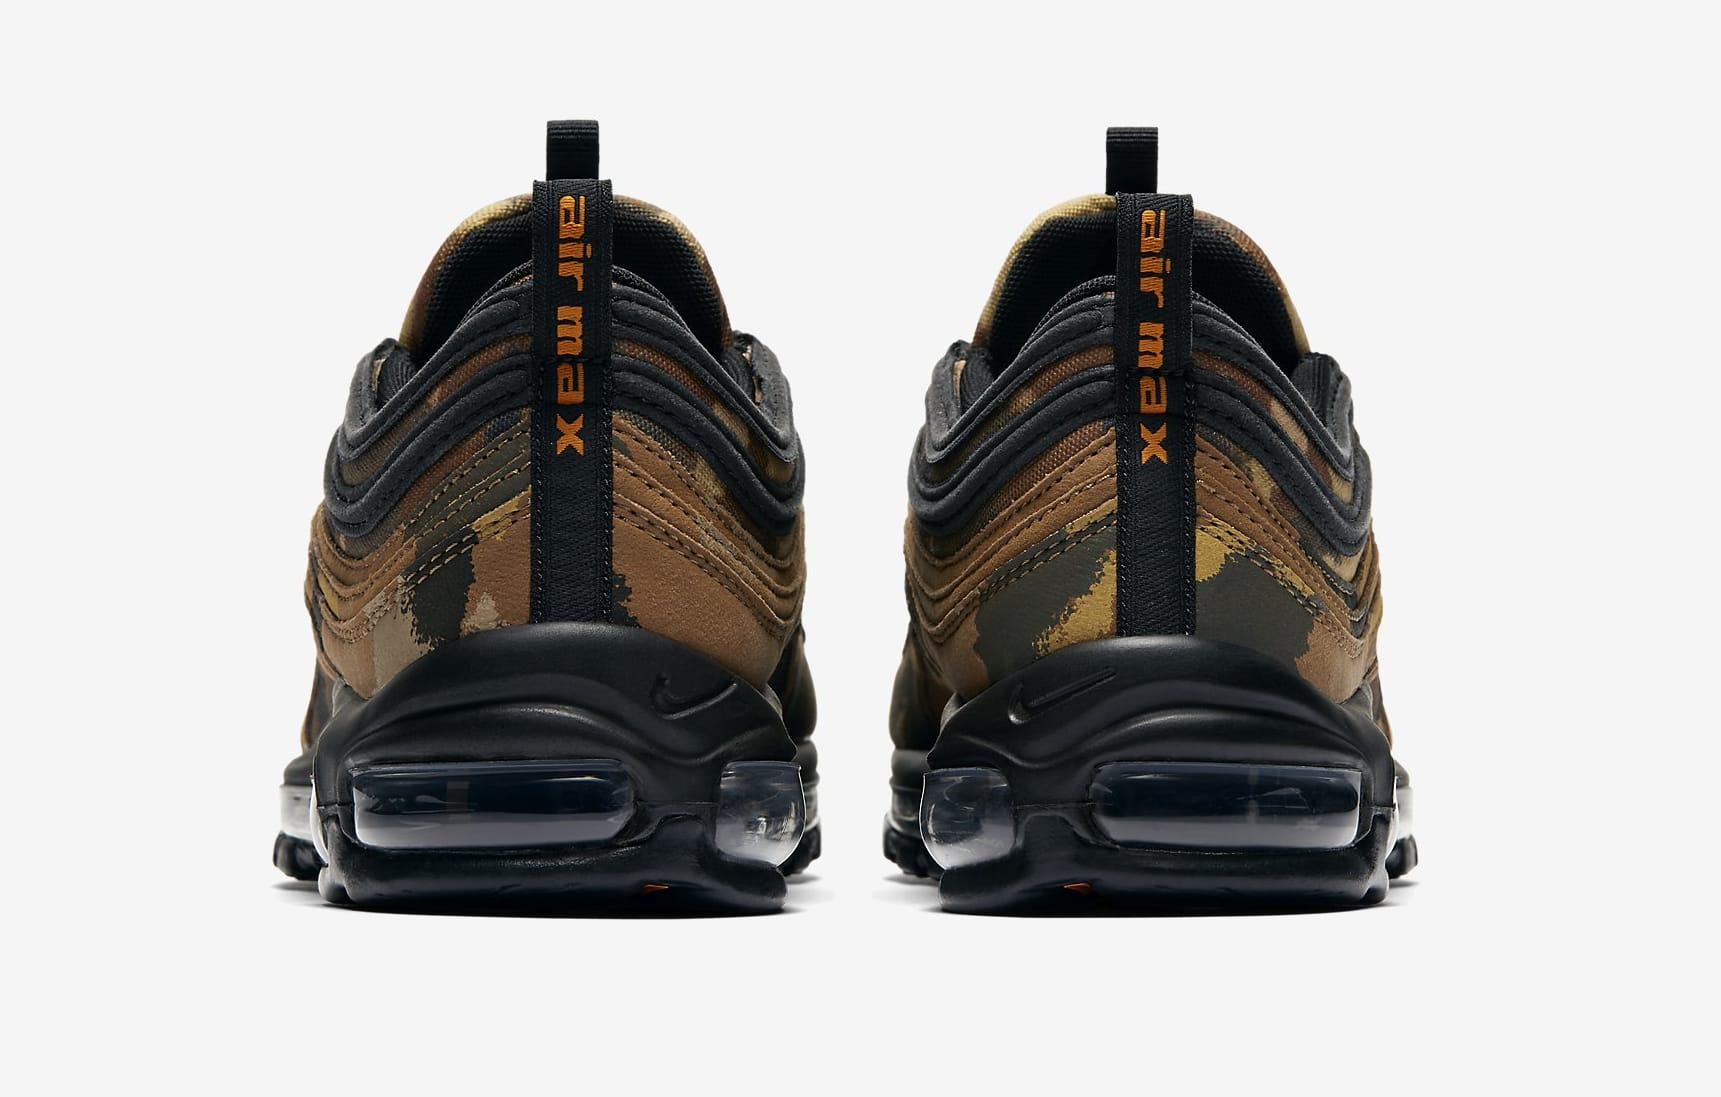 Nike Air Max 97 'Country Camo' Italy AJ2614-202 (Heel)